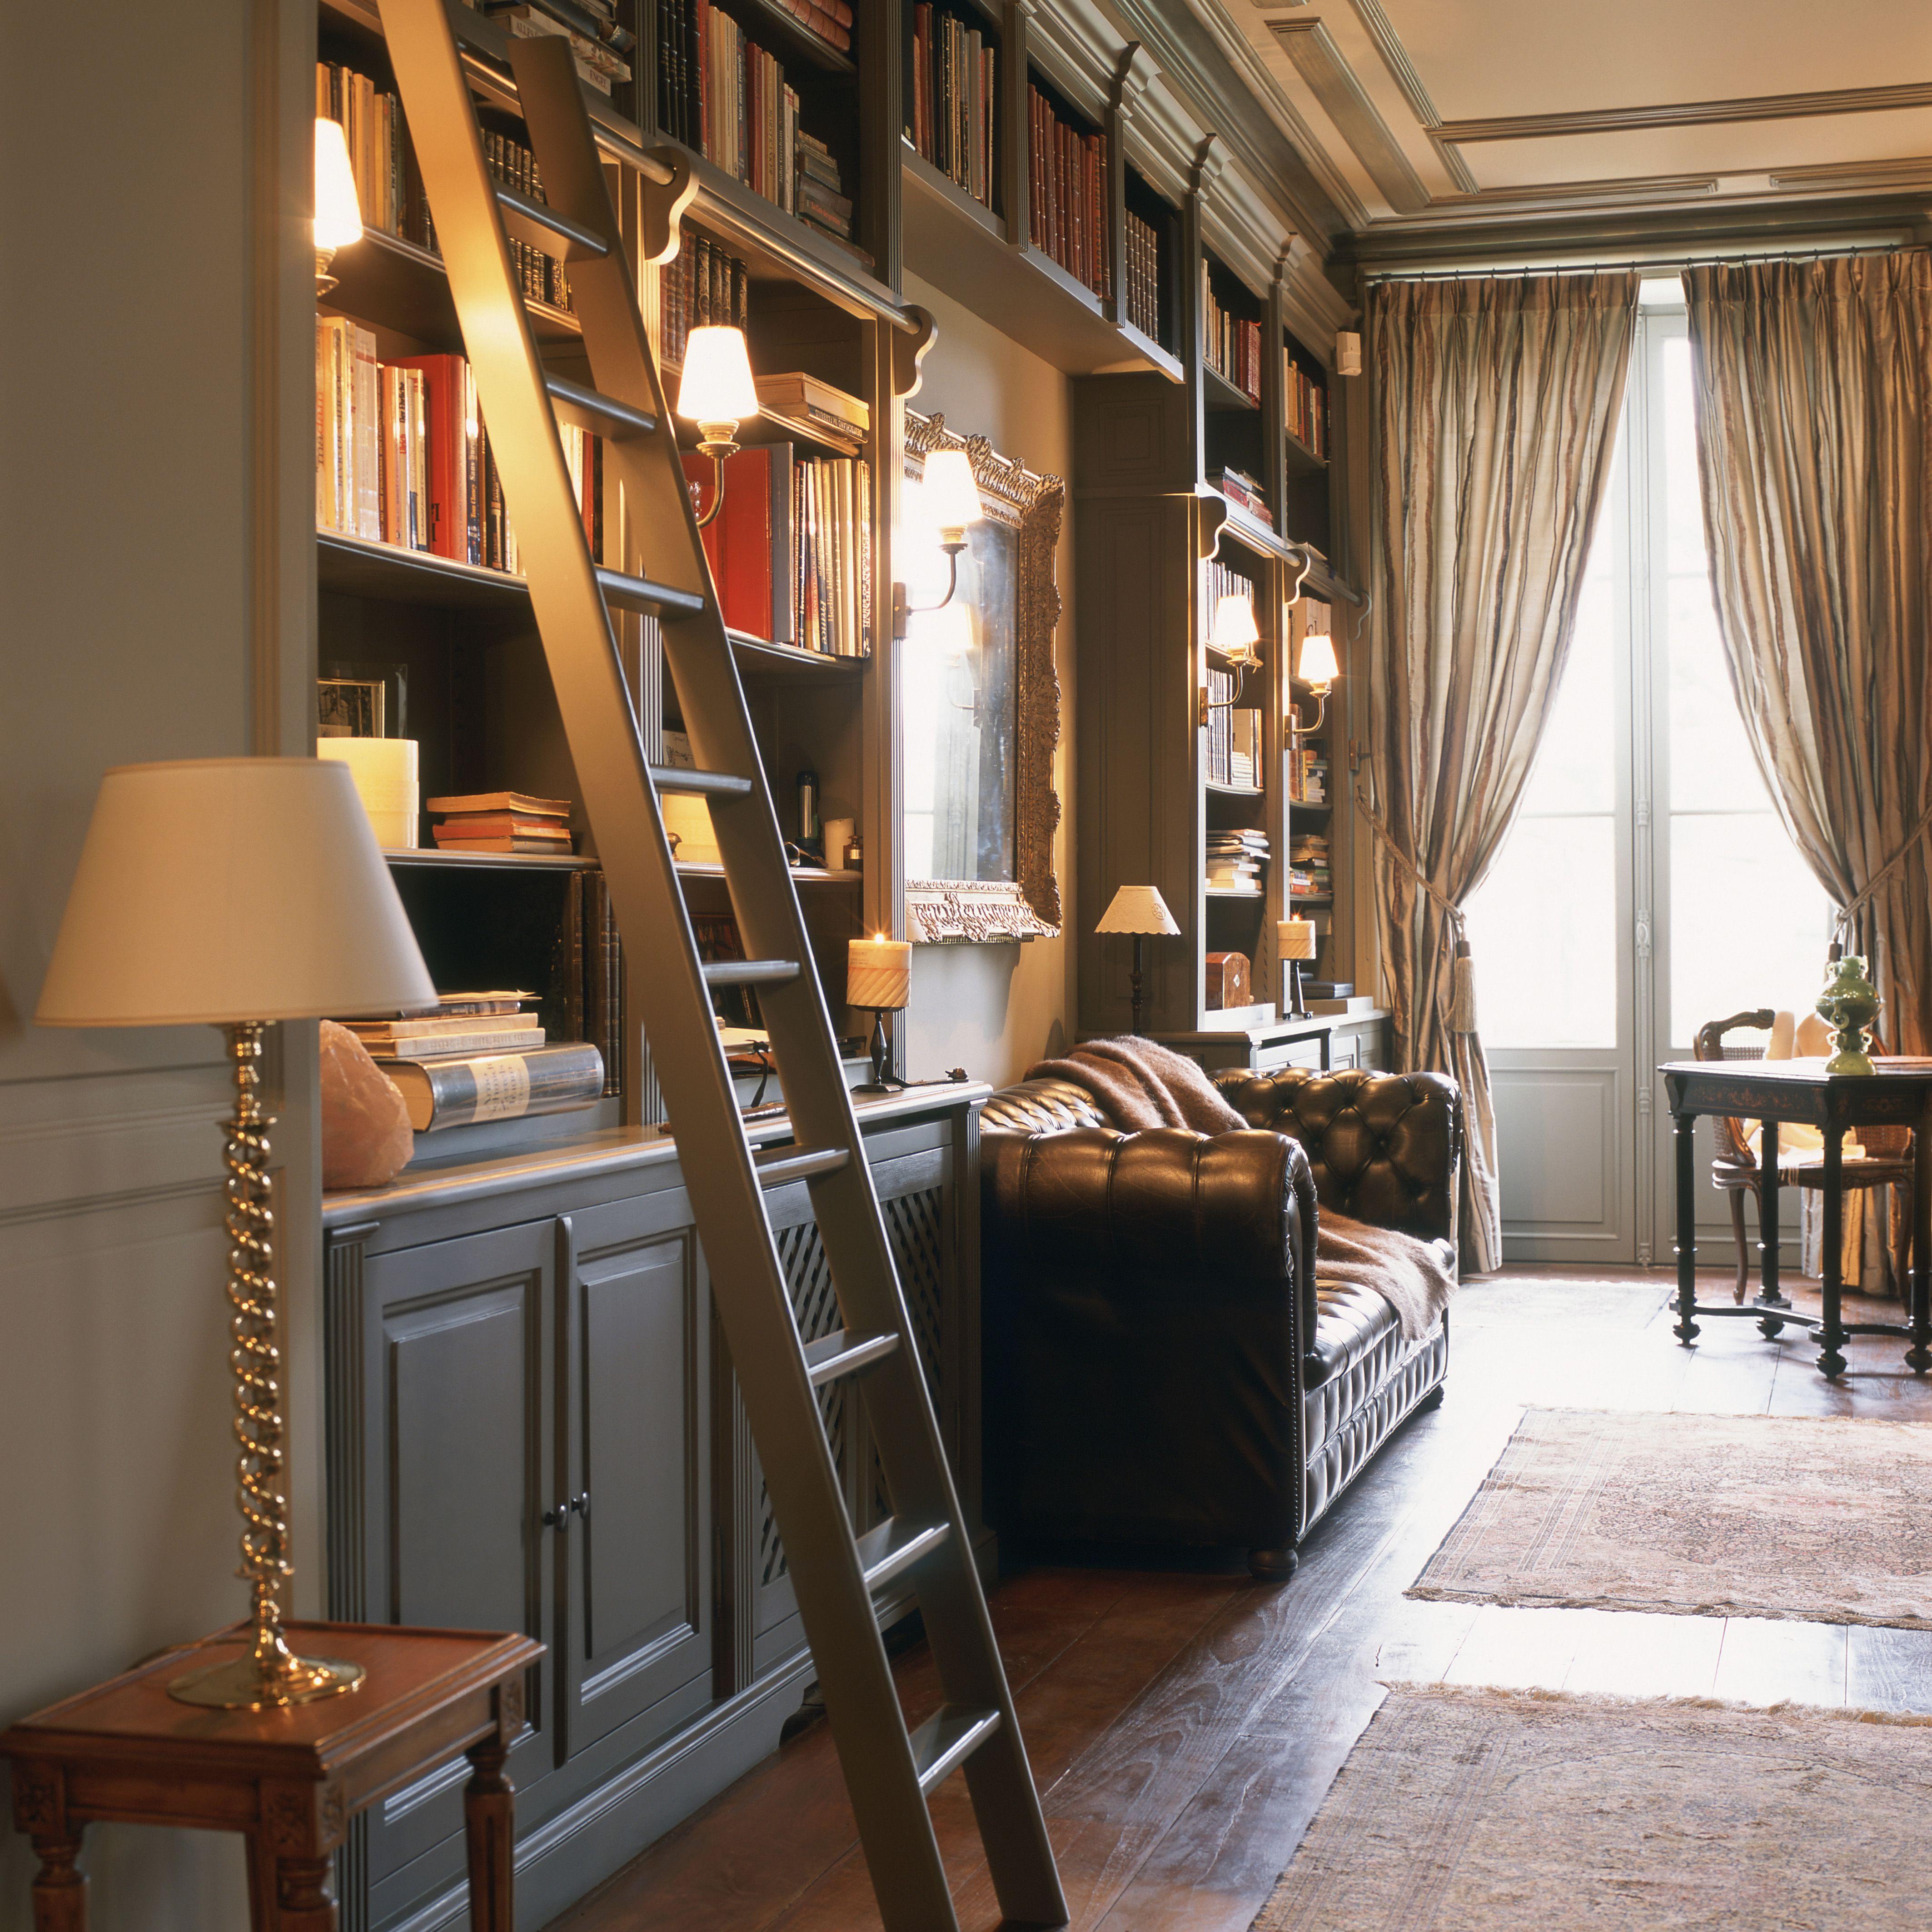 Bookcase Made To Measure Designed And Produced By Baden Baden Bruxelles Bibliotheque Sur Mesure Dessi Bibliotheque A Domicile Mobilier De Salon Idees De Decor